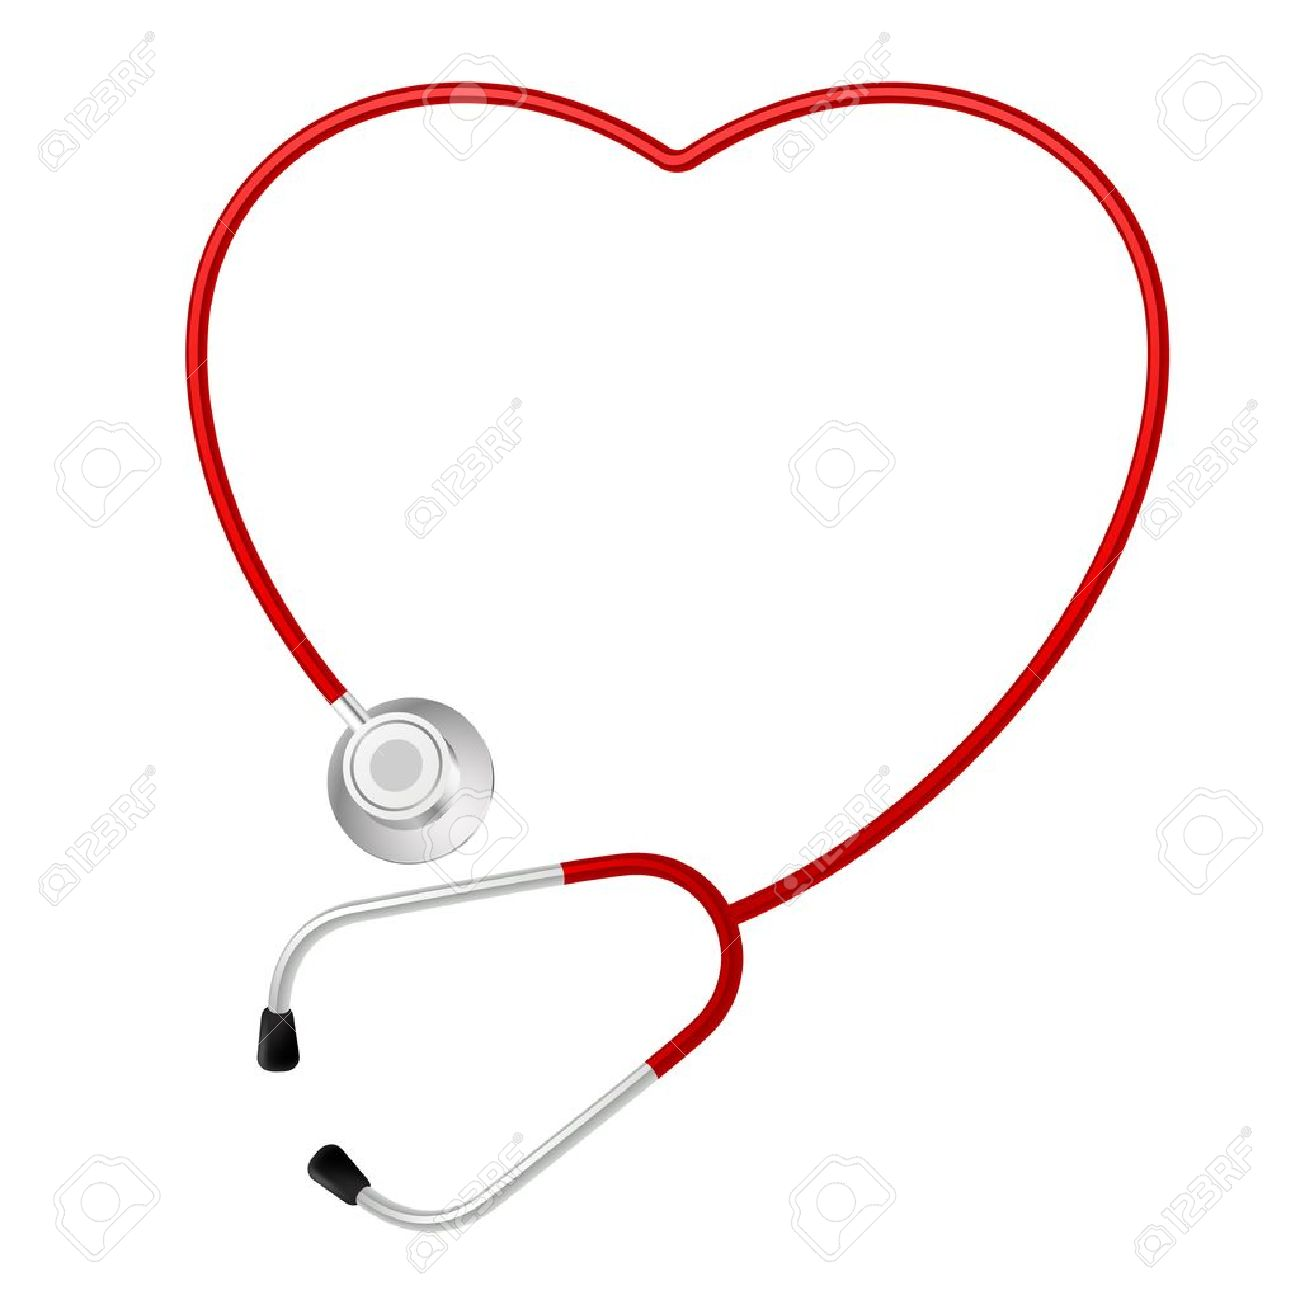 Stethoscope Heart Symbol. Illustration on white background Stock Vector - 12490963